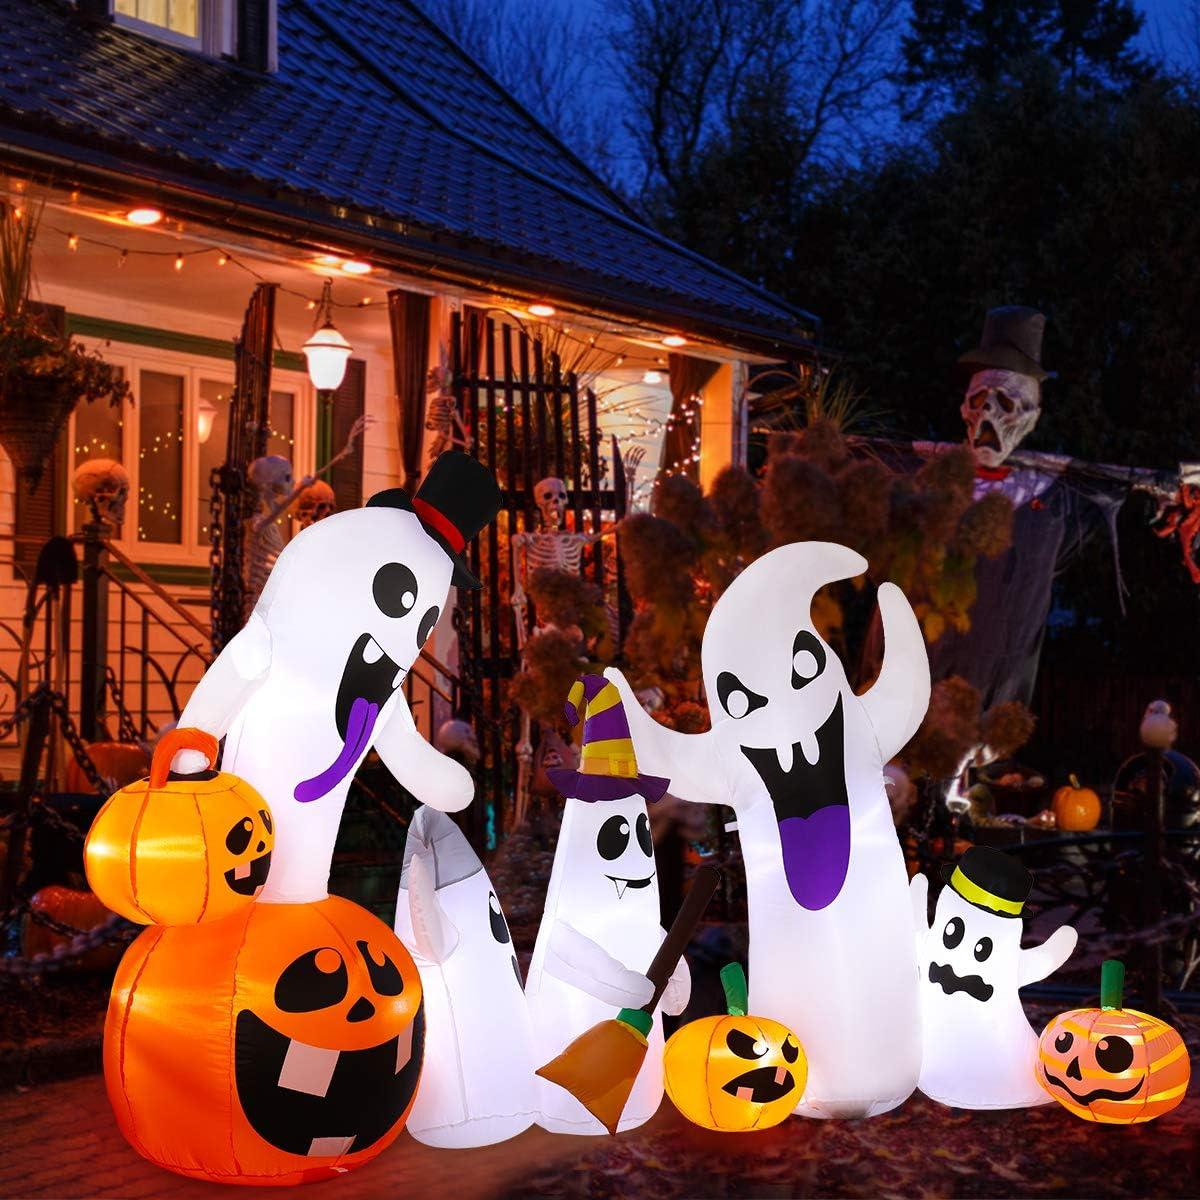 Halloween Inflatable Ghosts Pumpkin Ghost Inflatable Decoration Halloween swinging ghost with led illumination 8 FT